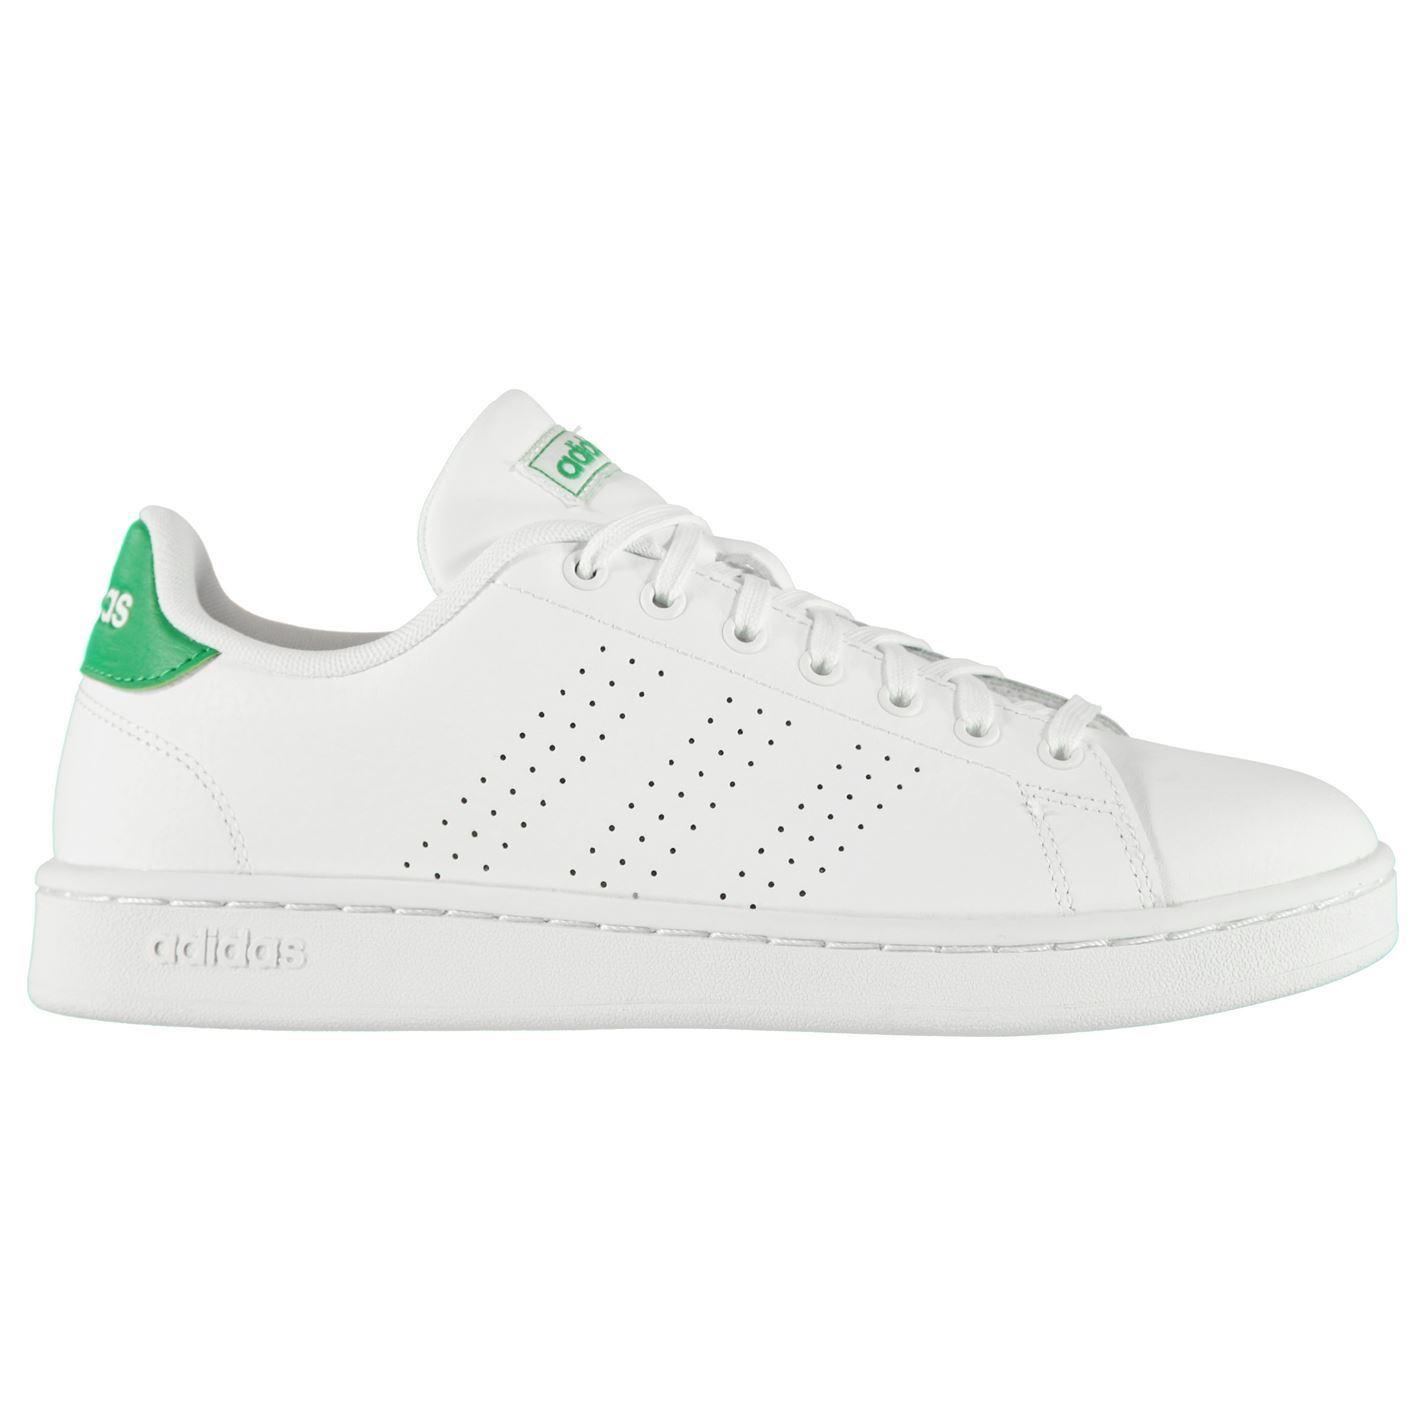 Adidas-Advantage-Baskets-Homme-Chaussures-De-Loisirs-Chaussures-Baskets miniature 3